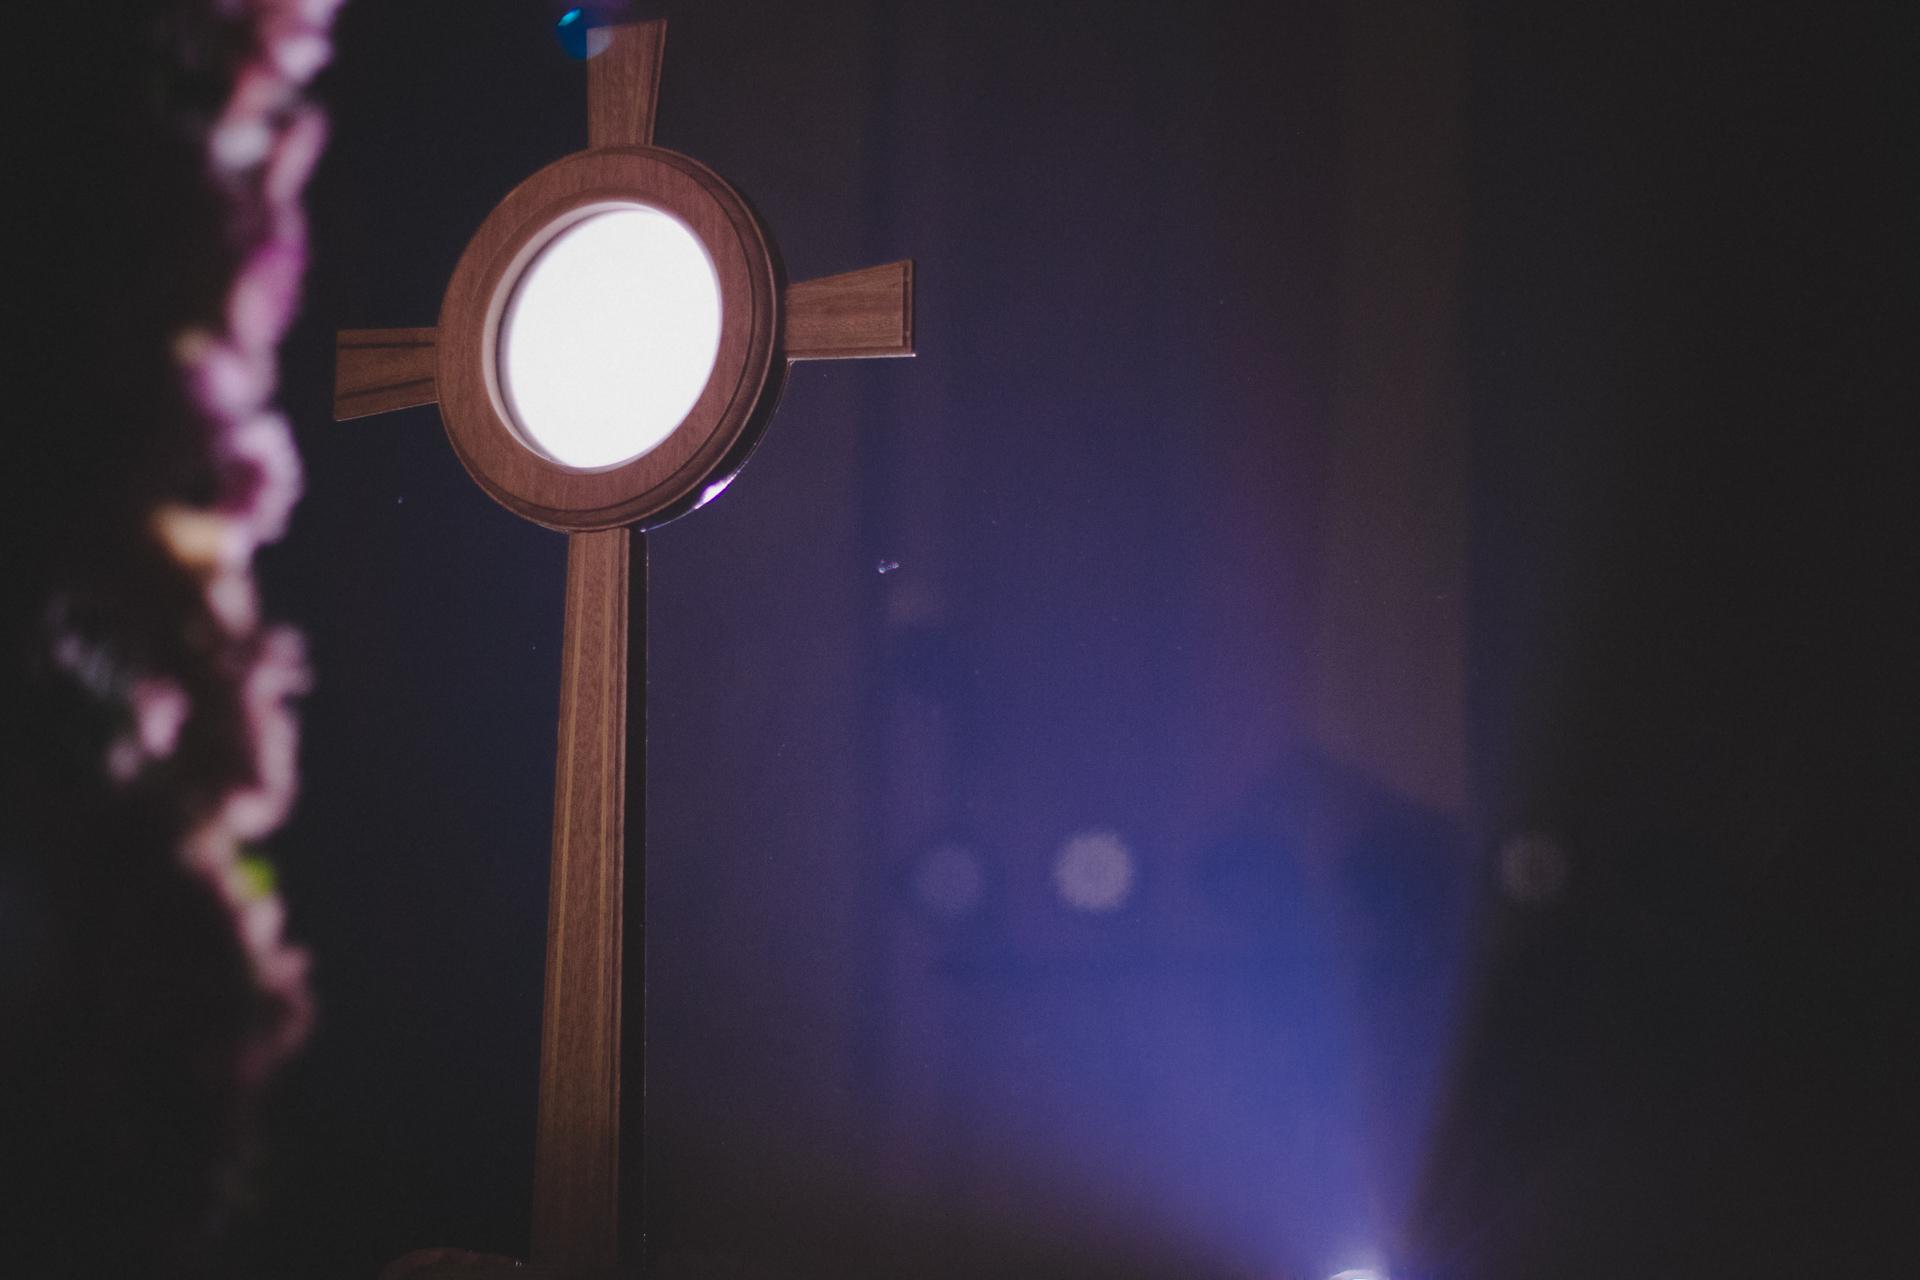 Evangelio del domingo 8 de agosto: